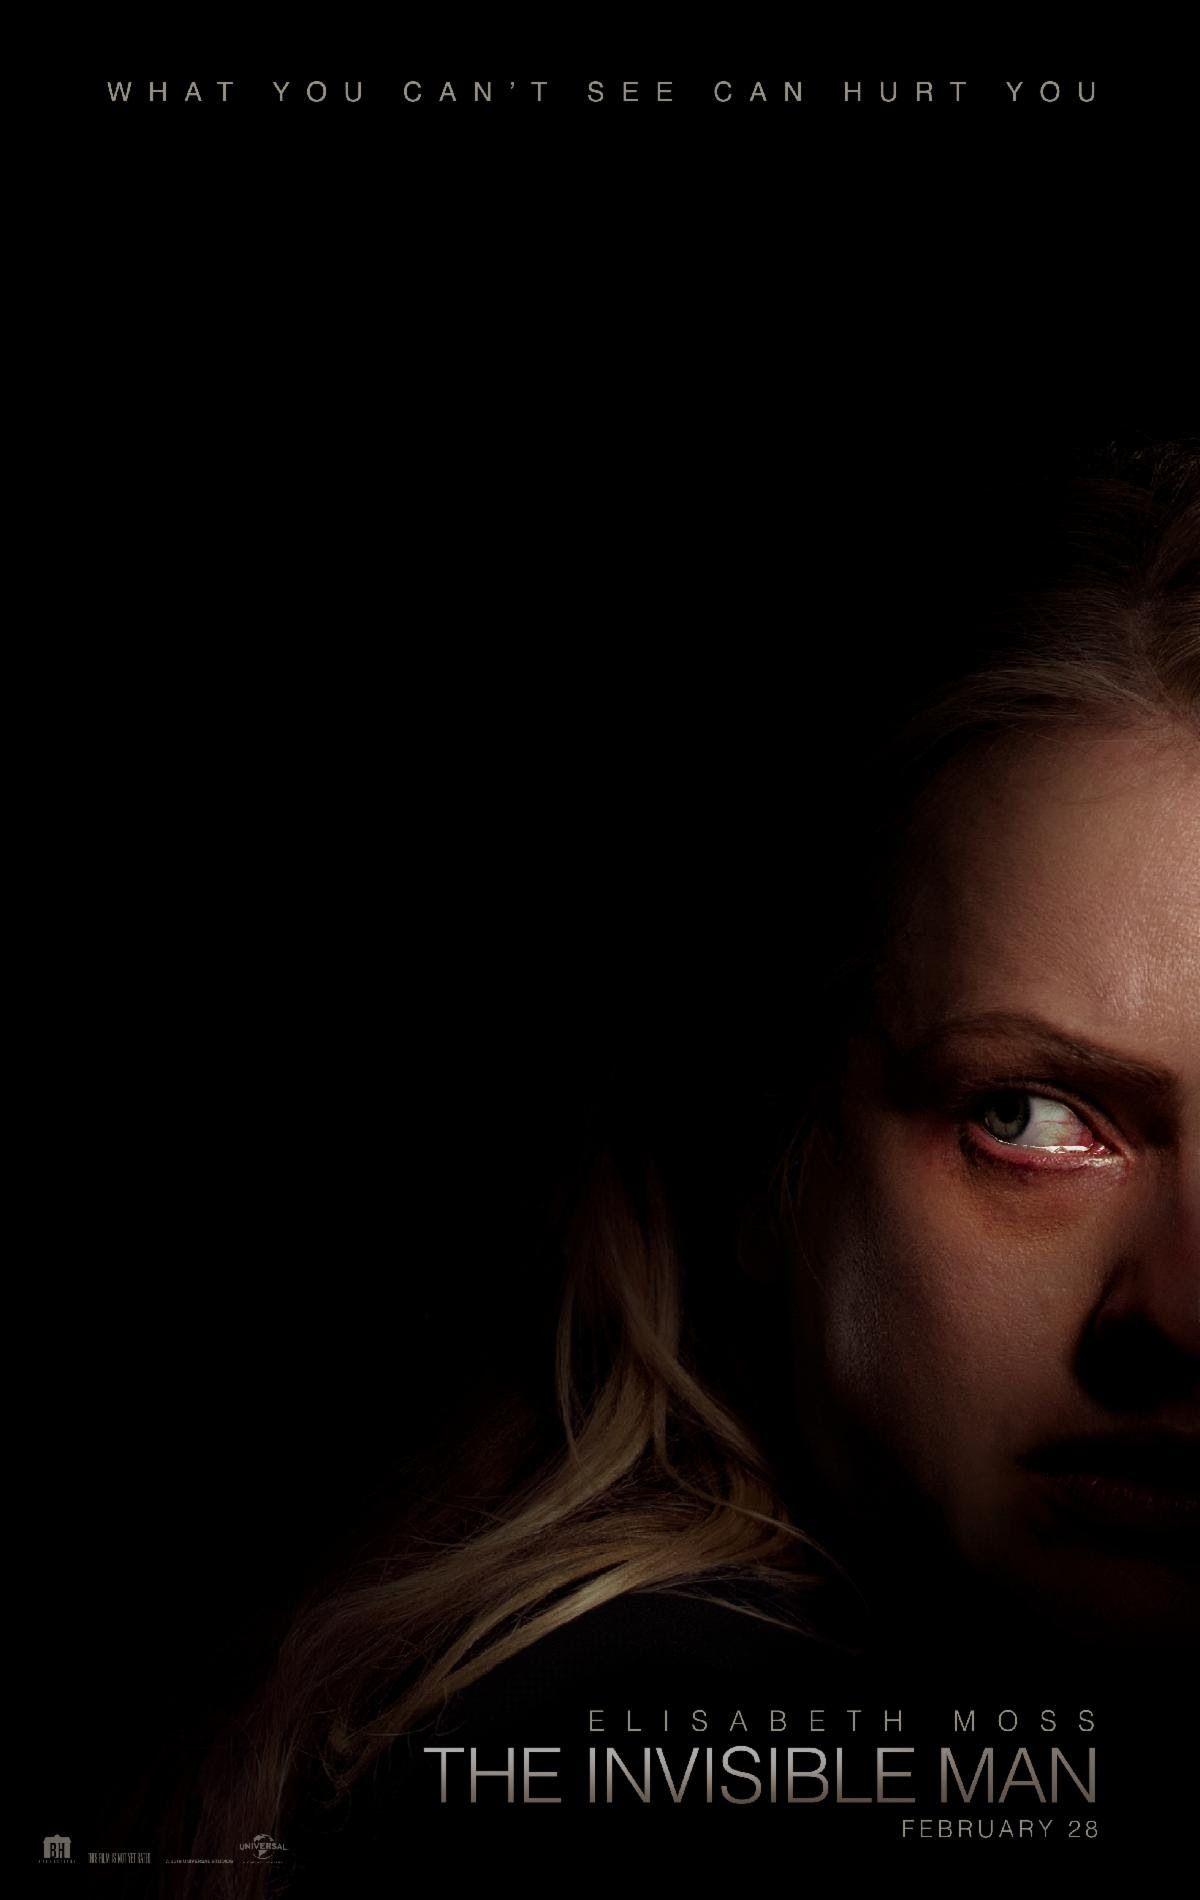 4 U Yerli 9 Film Vizyona Girecek Film Korku Vizyon